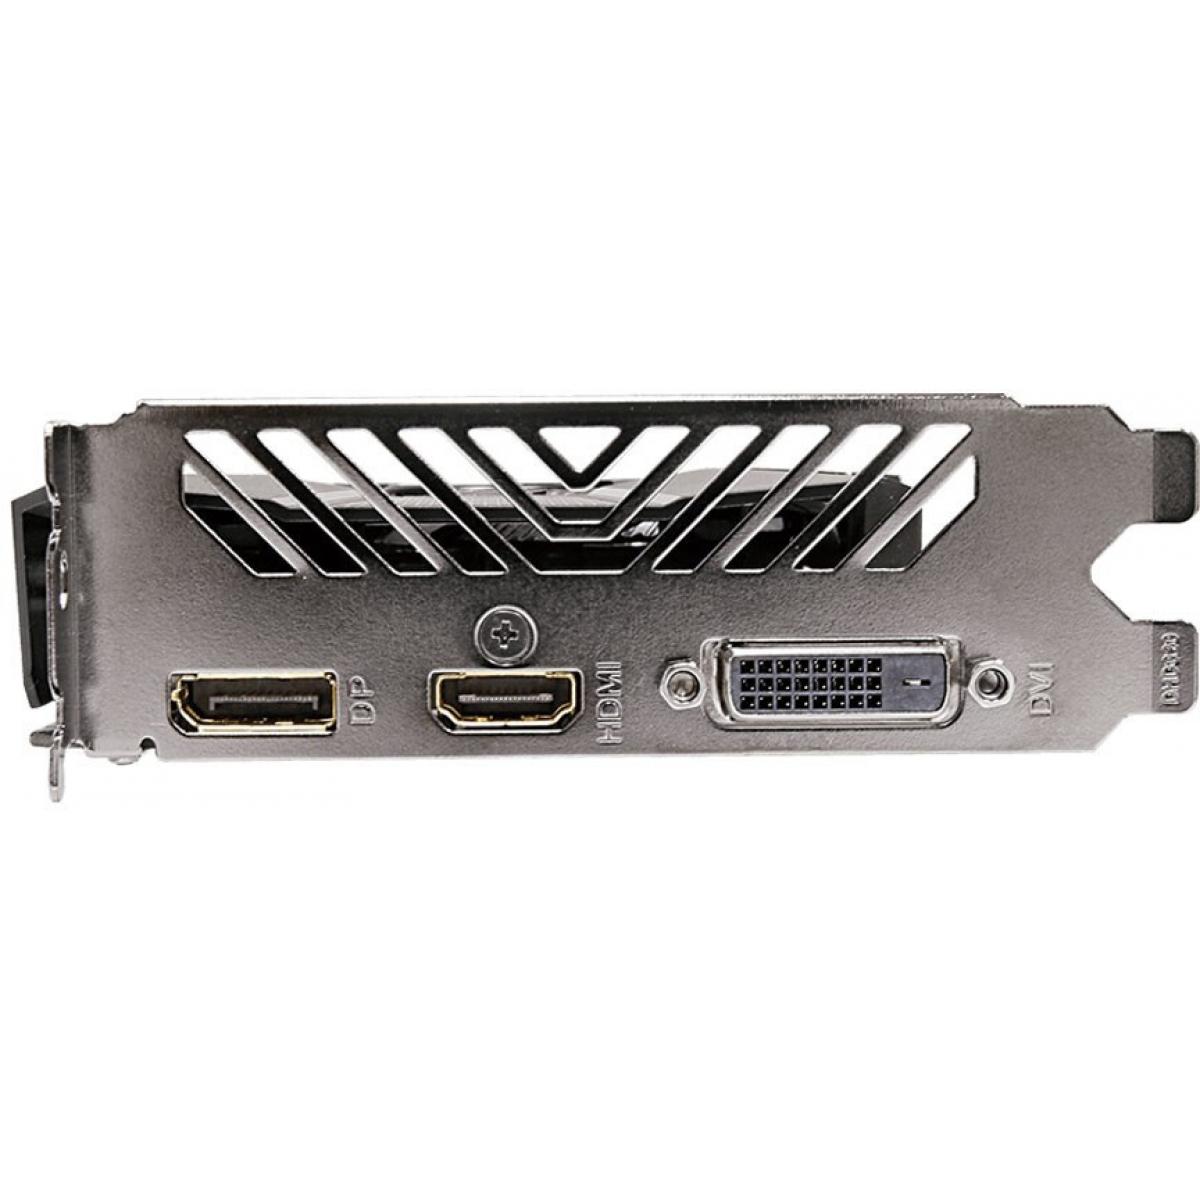 Placa de Vídeo Gigabyte Radeon RX 560 OC, 4GB GDDR5, 128Bit, GV-RX560OC-4GD